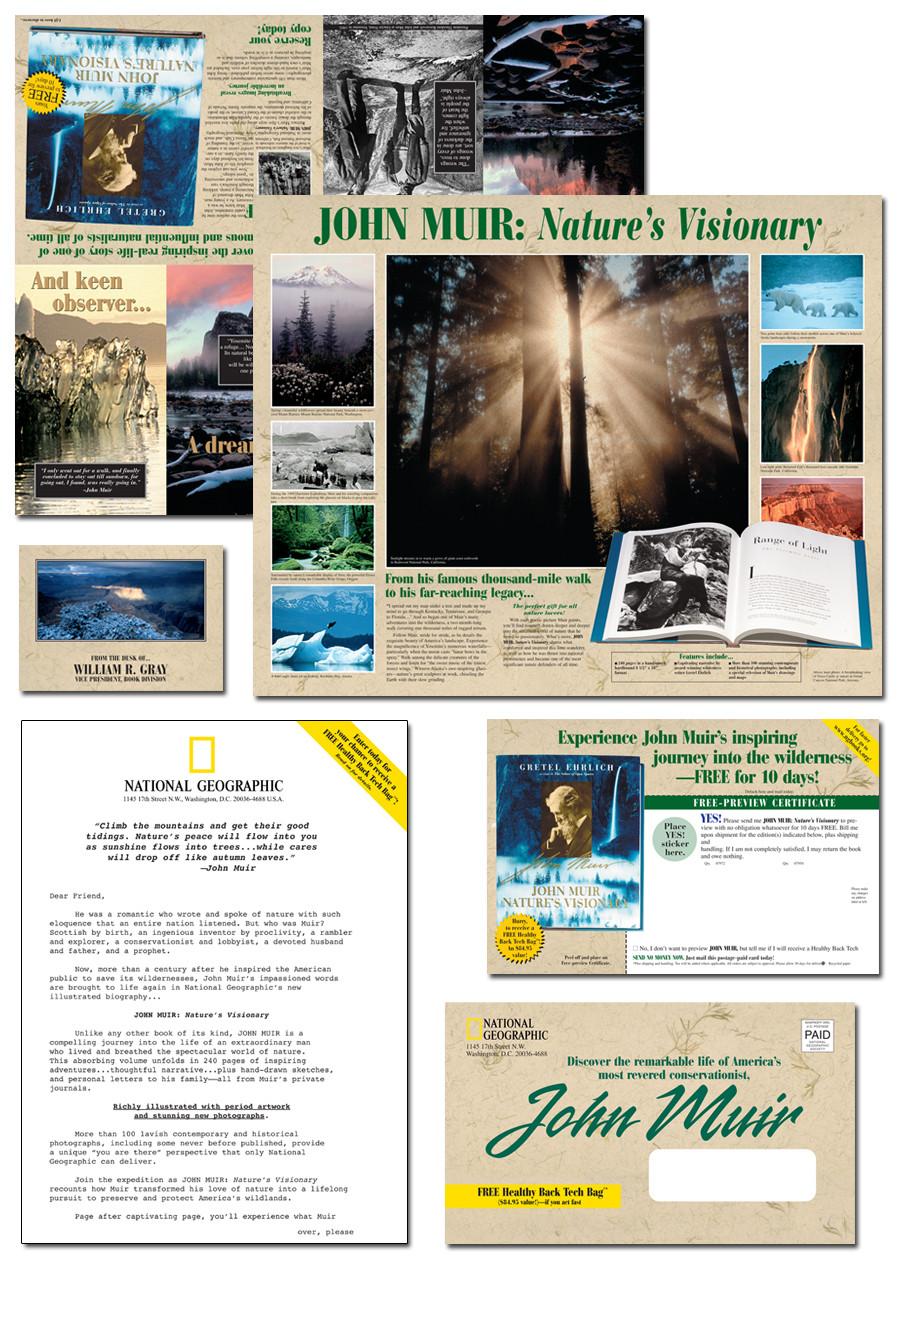 Naitonal Geographic John Muier Book Promotion